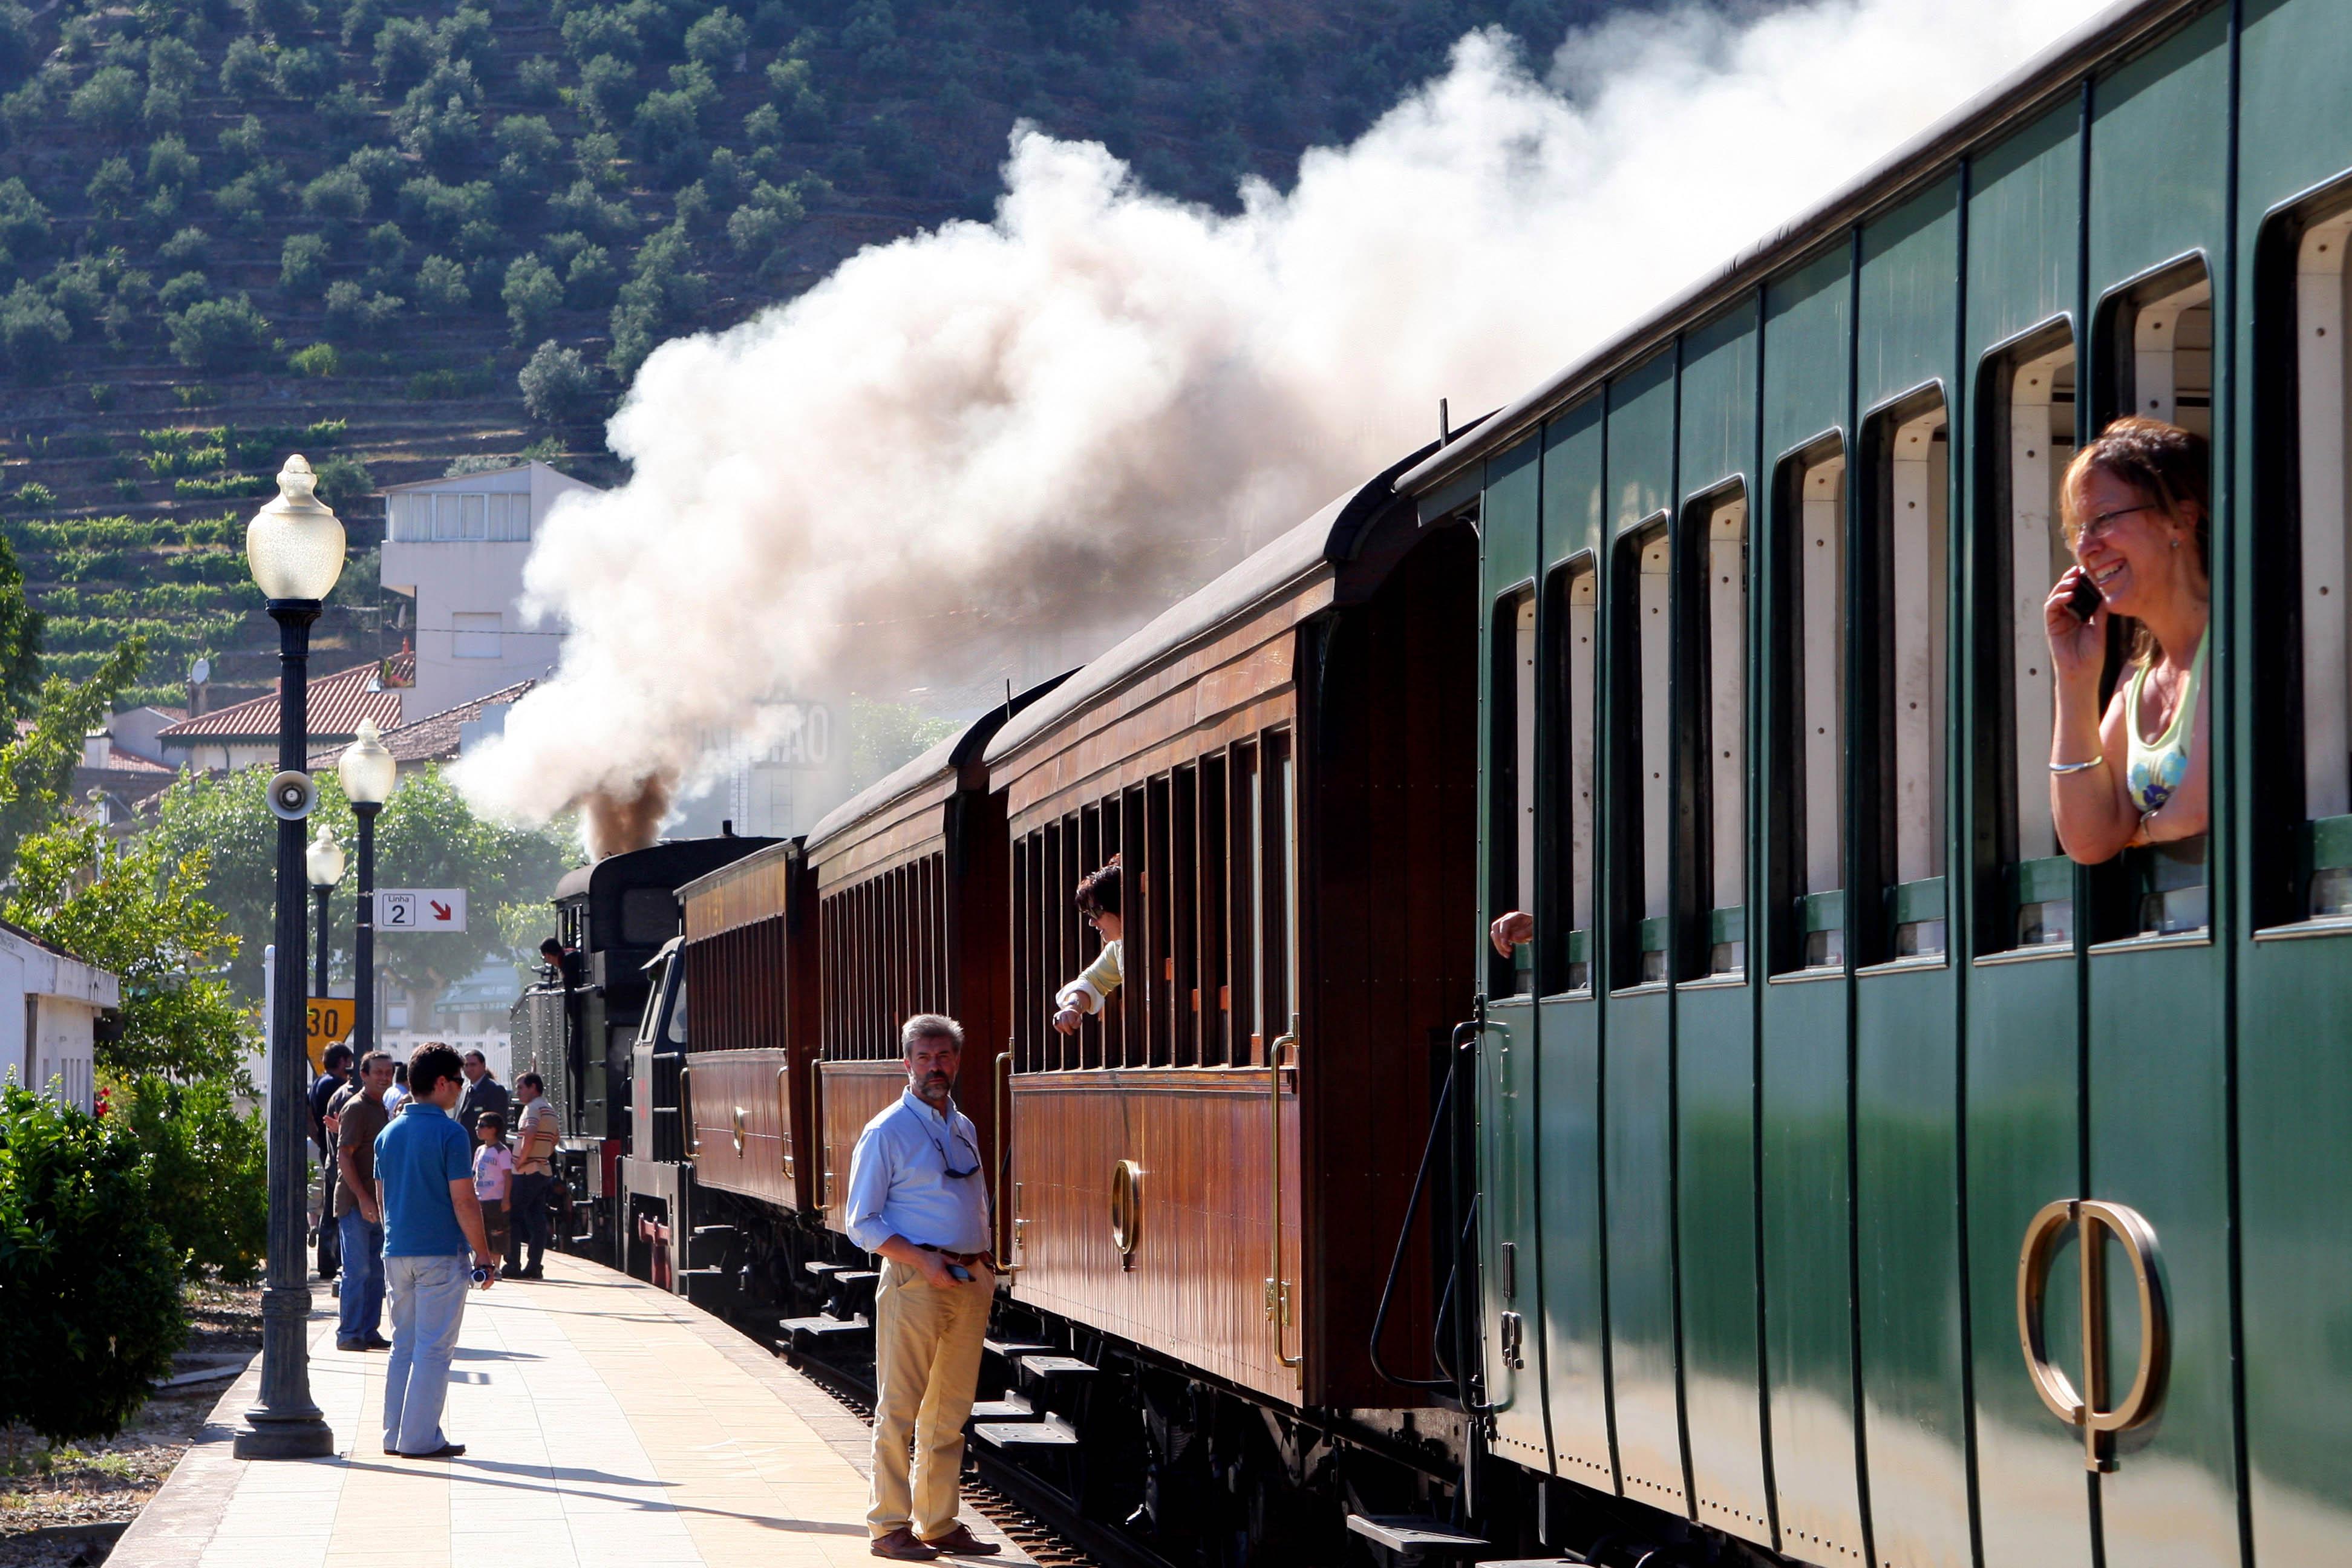 Comboio Histórico do Douro chega segunda a S. Bento no Porto